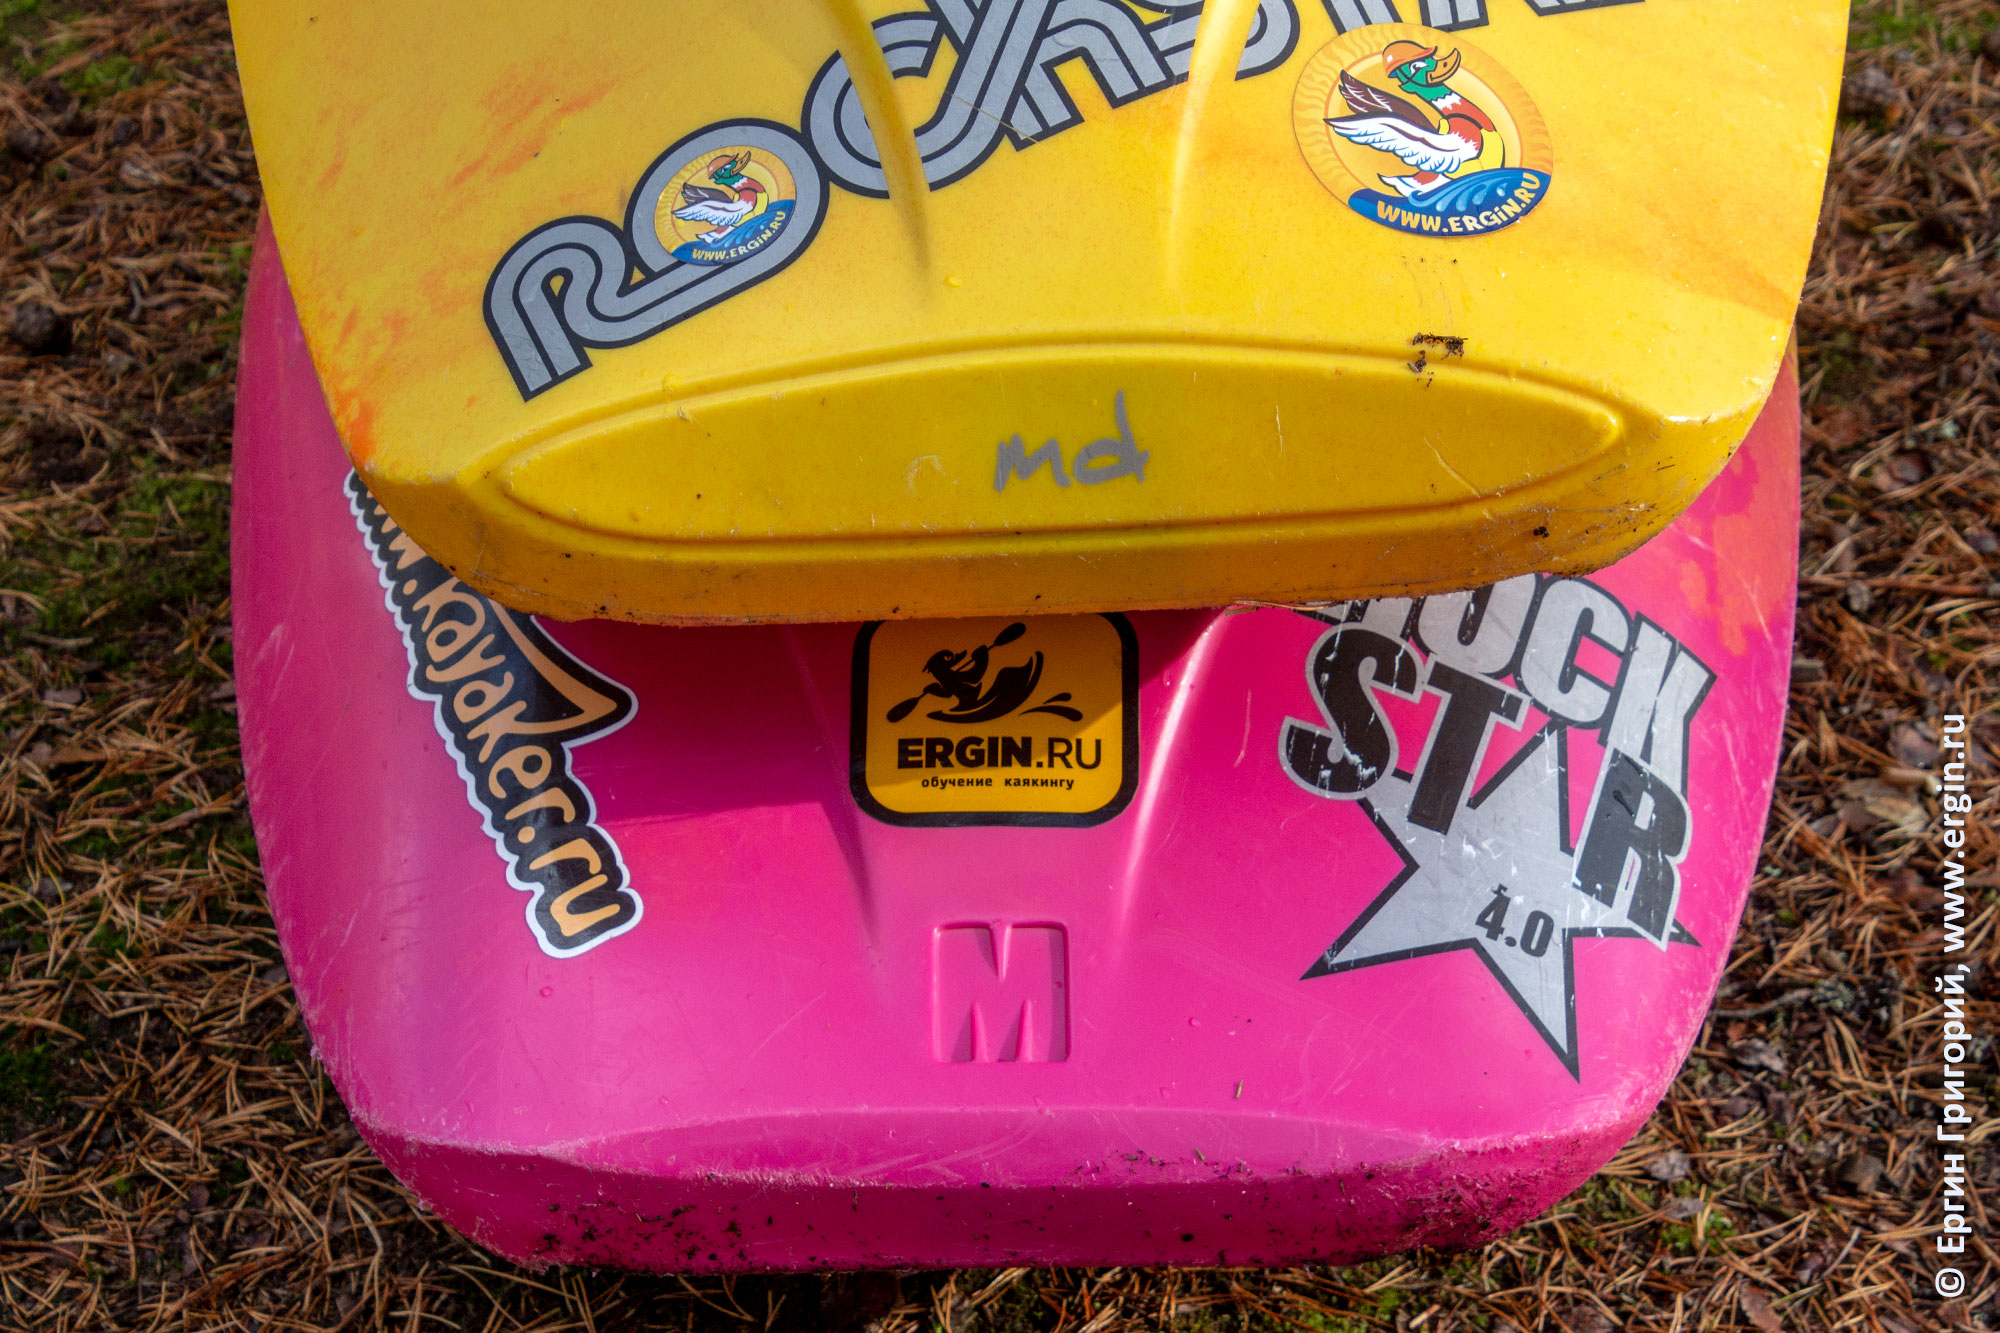 JacksonKayak RockStar 4.0 новая маркировка размера лодки на корме